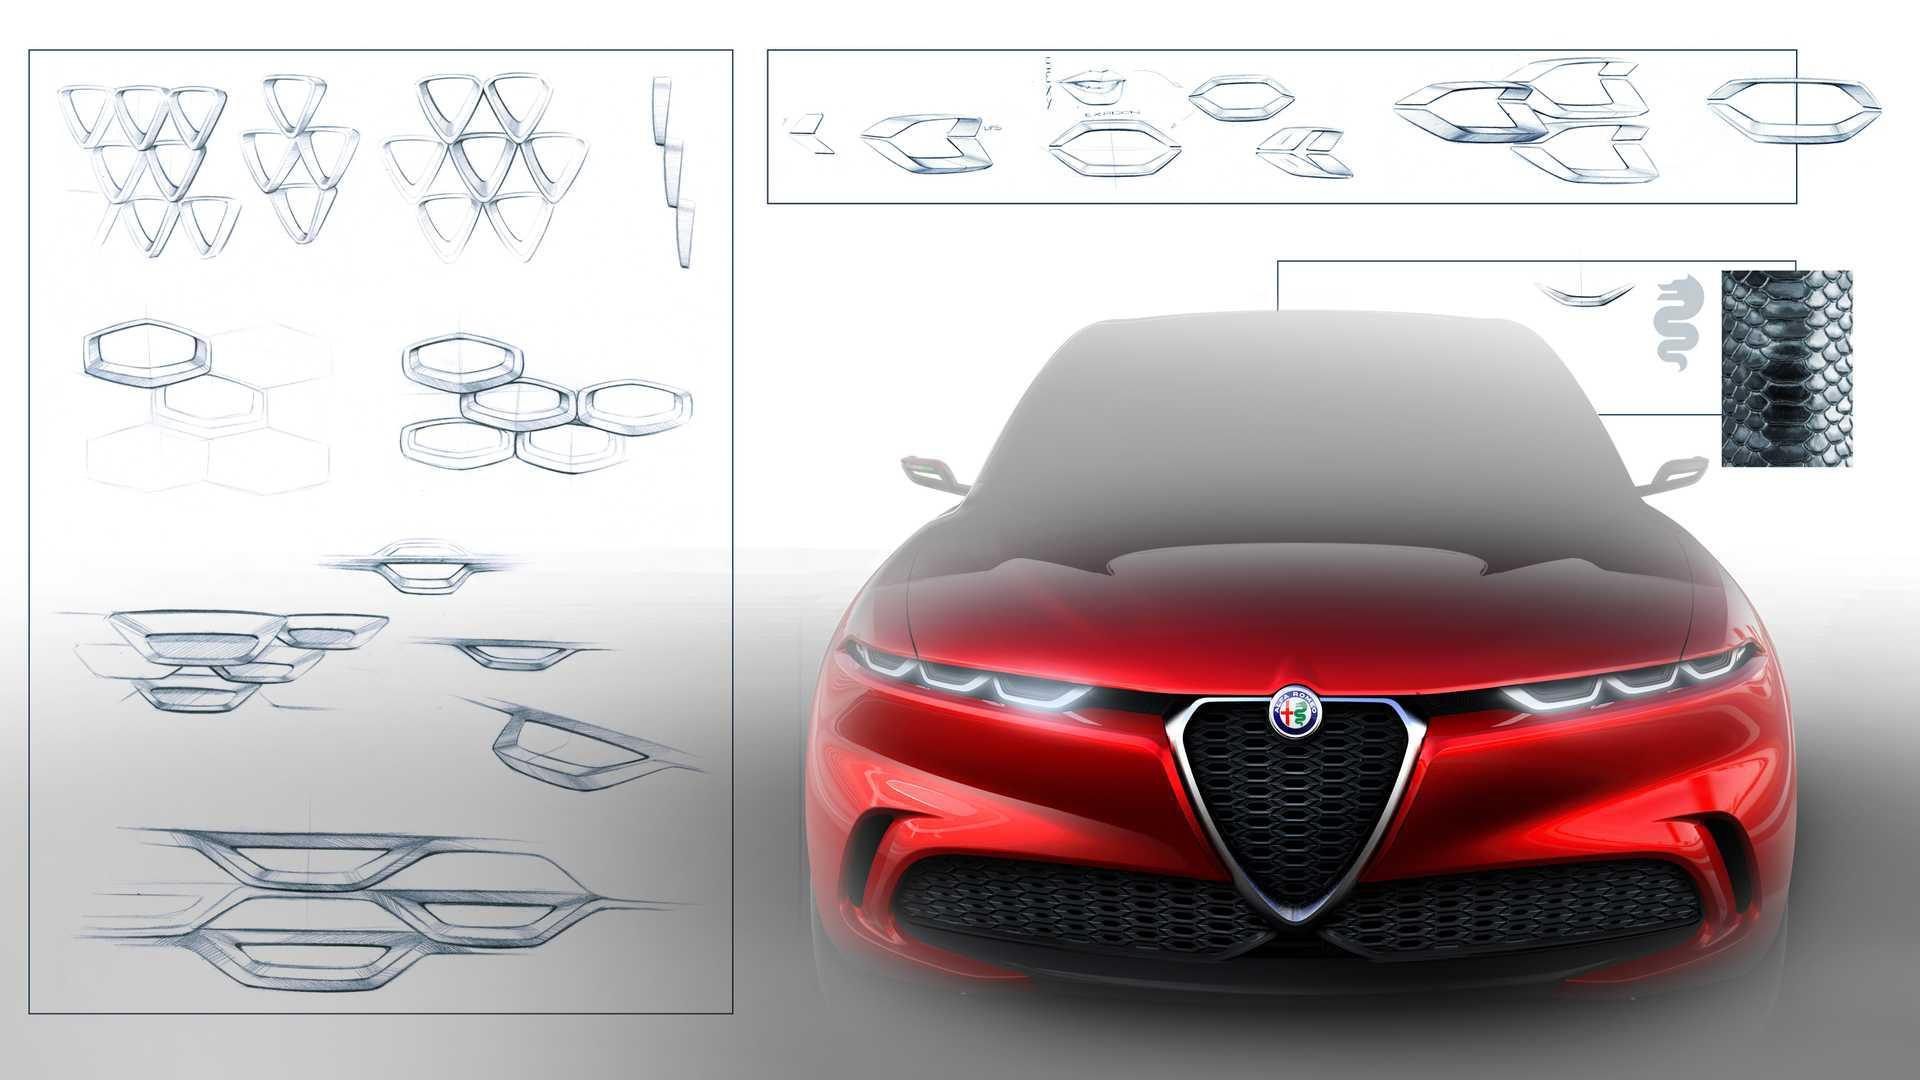 Post in Alfa Romeo Tonale / Alfa Romeo C-SUV